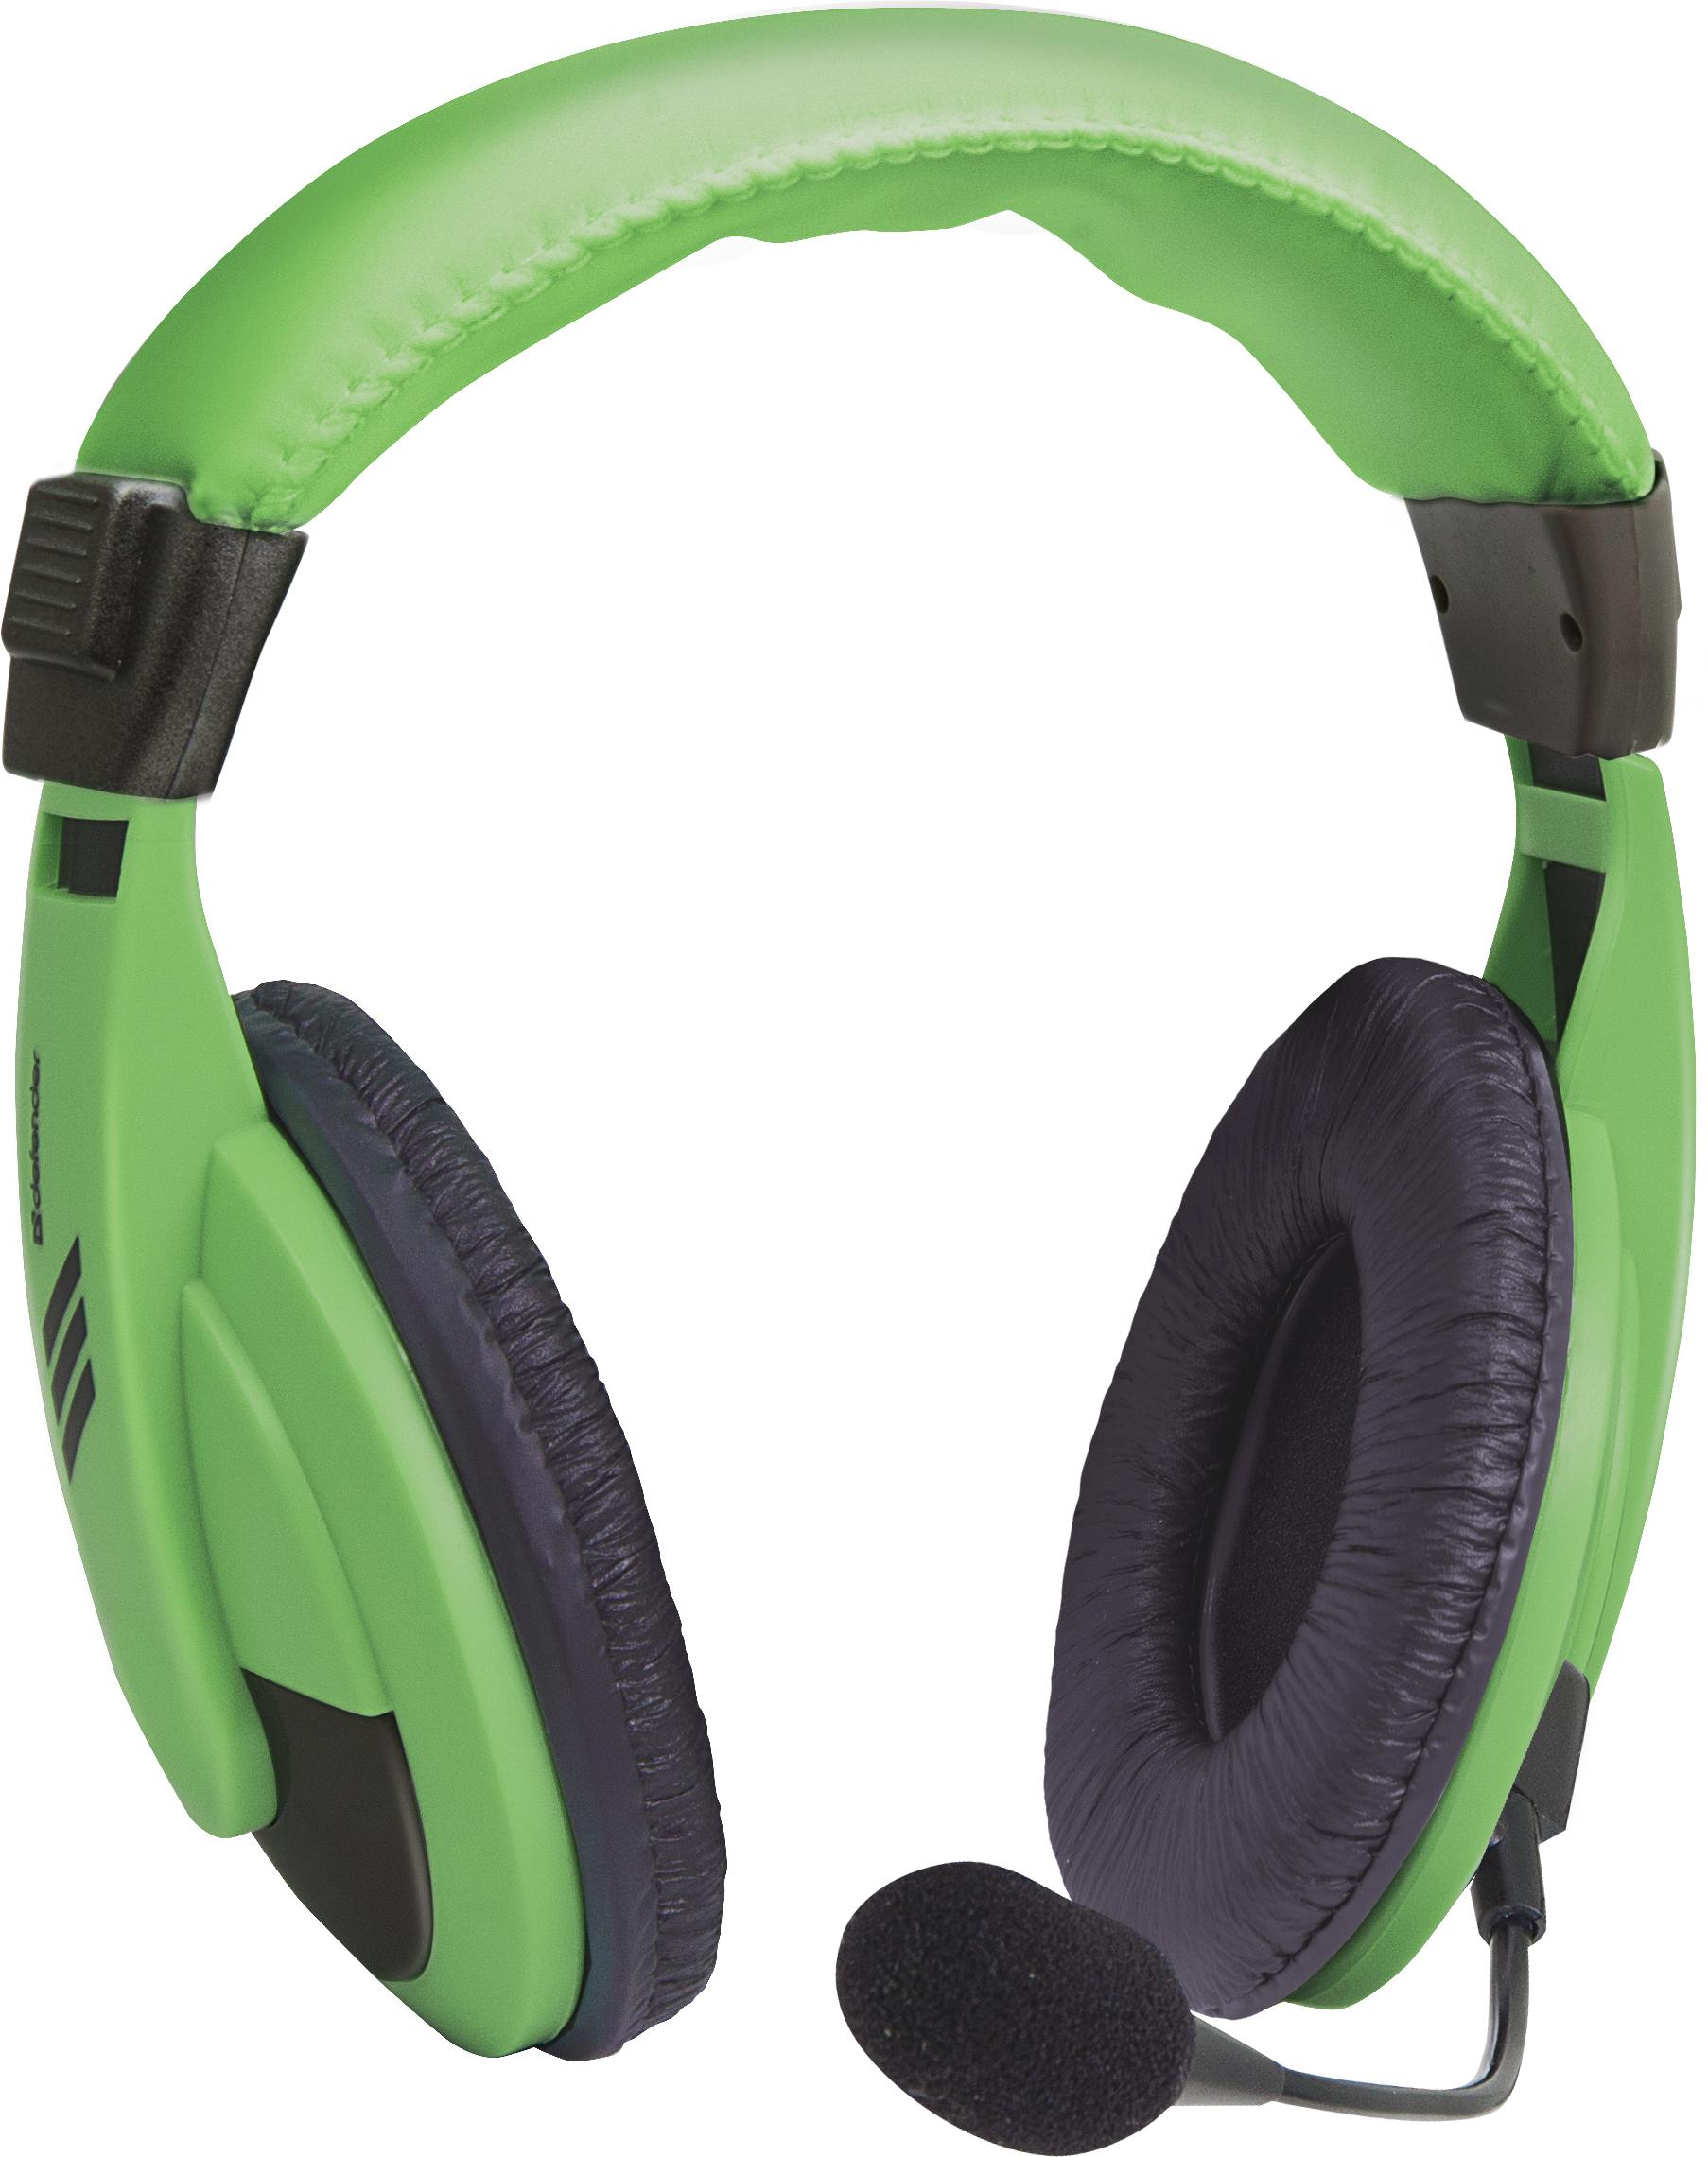 Компьютерная гарнитура Defender Gryphon 750, 63749, зеленый цены